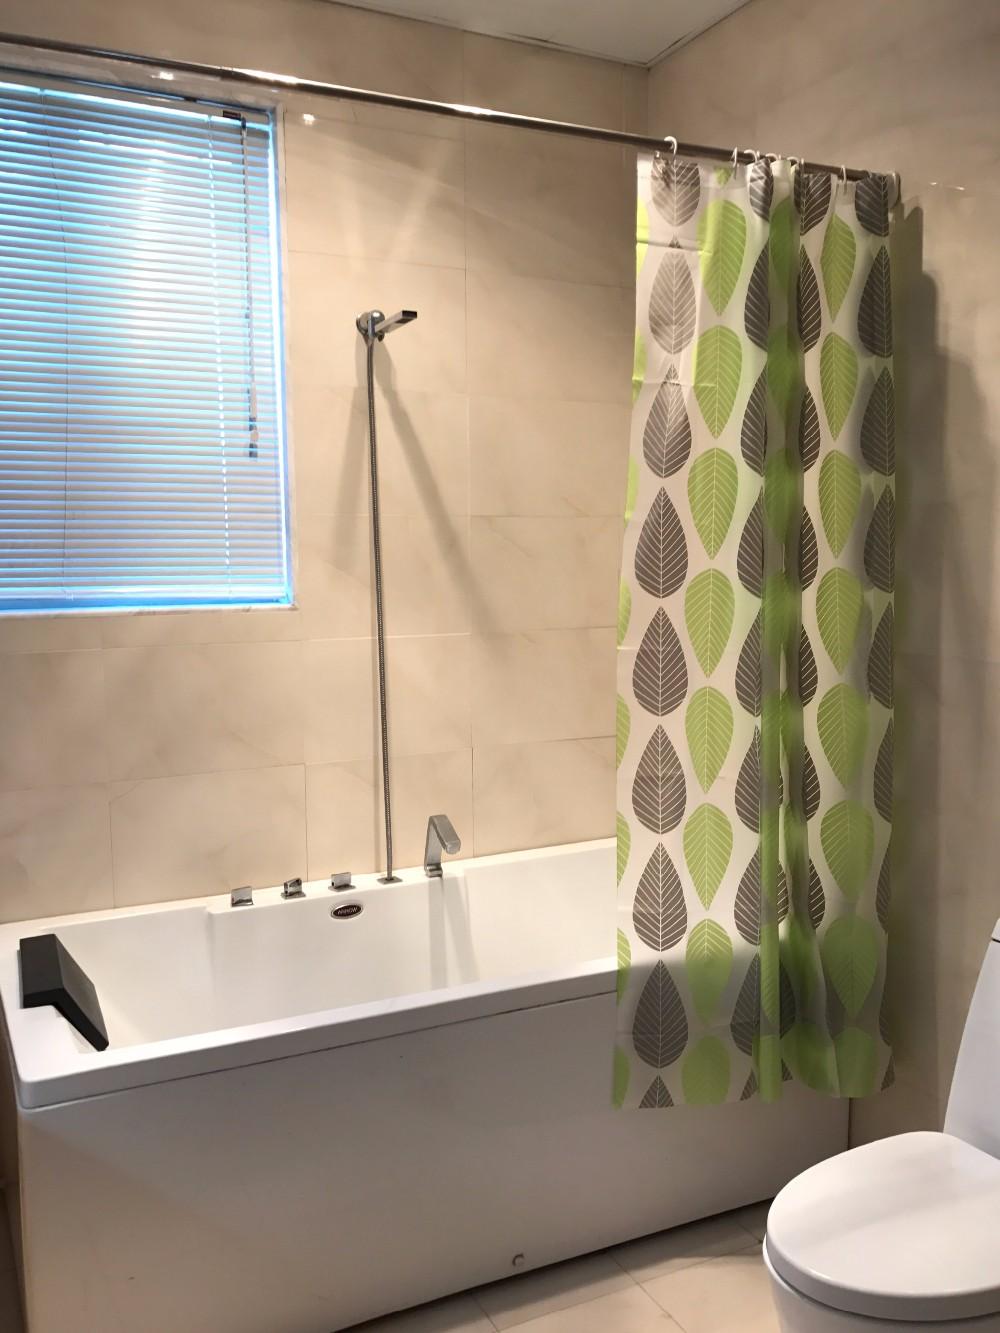 3D Custom Printed Design Eco Friendly Green Leaves PEVA Shower Curtain With 12 Plastic Hooks